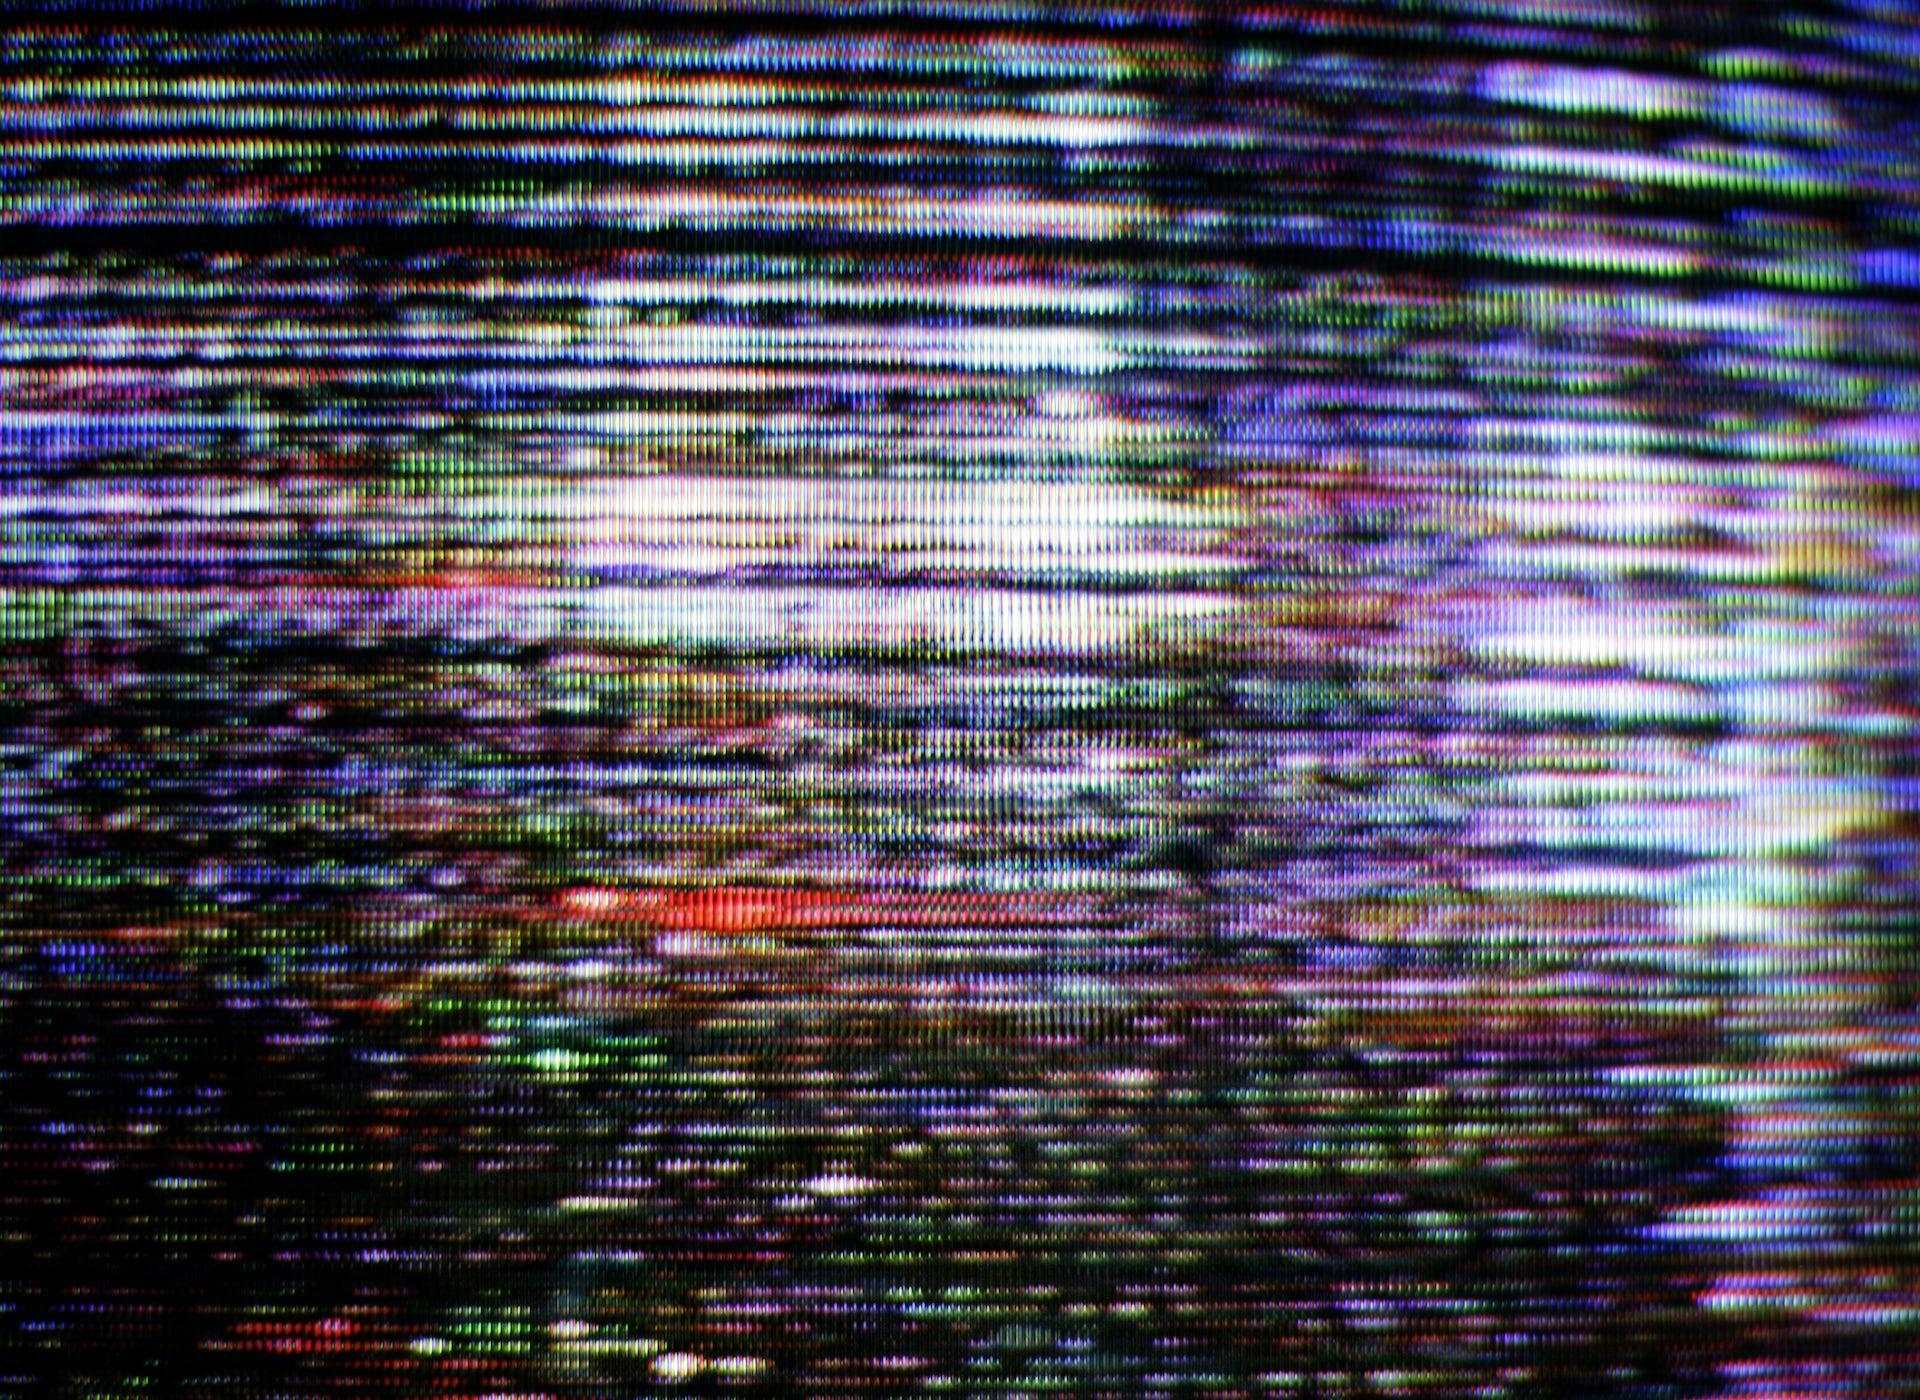 Image 20151222 27851 1n1x5cm.jpg?ixlib=rb 1.1